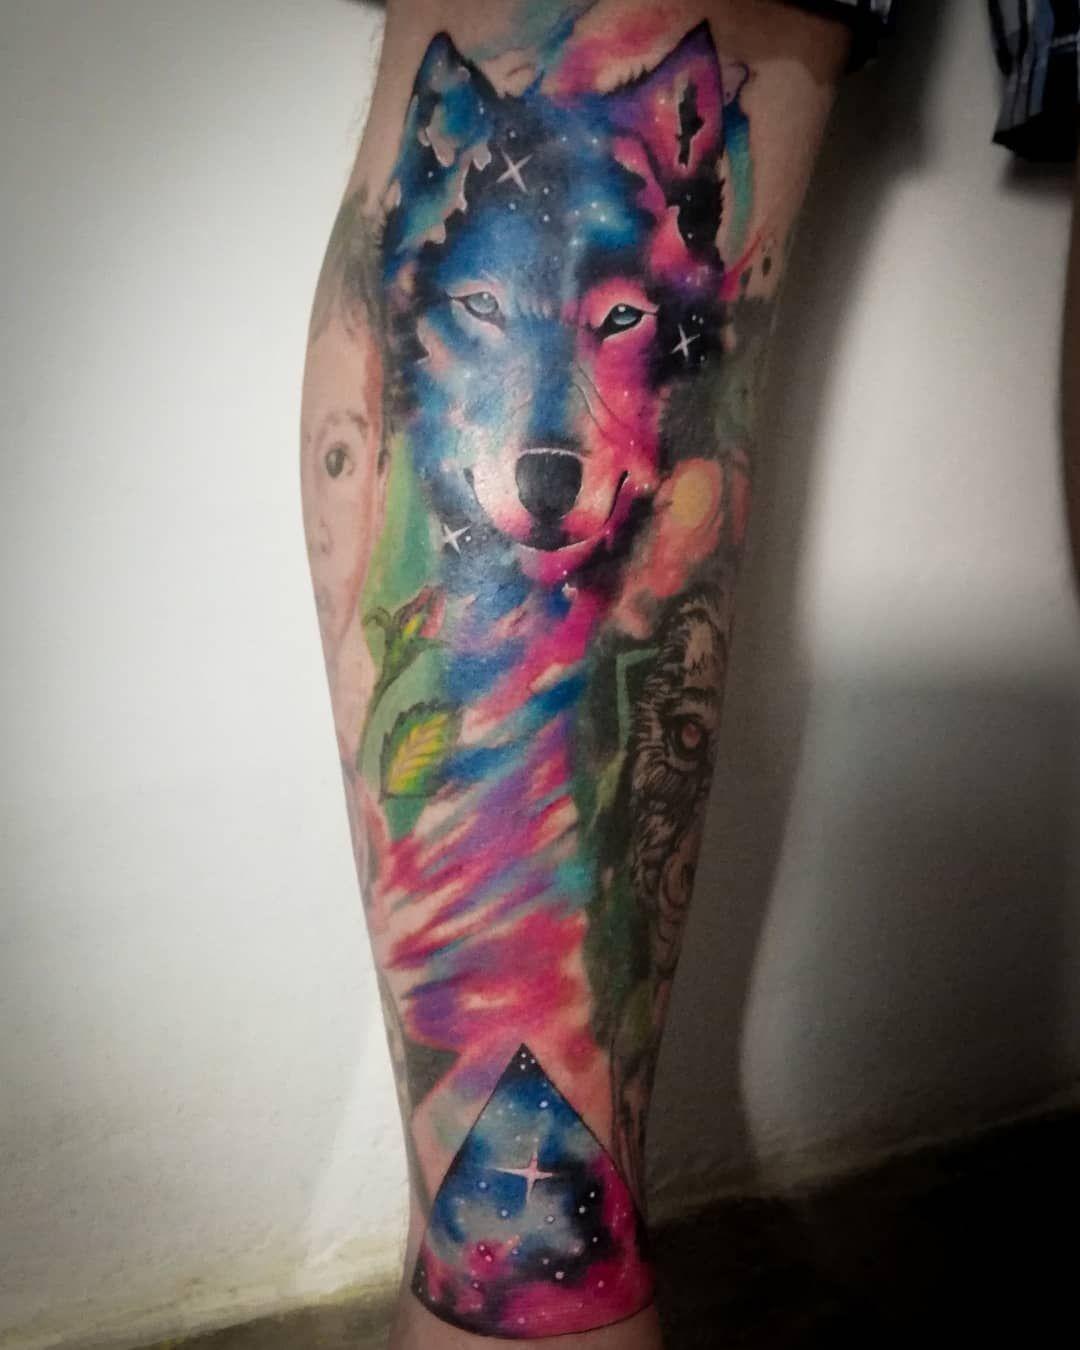 ❌Lobo❌  Espero les guste ✌️💀 Para alguna consulta, presupuesto o separar una cita pueden dejarme un mensaje al inbox o al WhatsApp 955835575 📲 (No llamadas) × × × × ×  #tattooart #koitattoo #happytattoo #perutattoo #peruart #peruvianart #peruvianartist #ink #tattoo #tarapoto #tarapotocity #dolartattoo #eternalink #letteringtattoo #watercolortattoo #tatuajes #tattooartwork #linework #mechanictattoo #biotattoo #biomecanico #mechanictattoo #blacktattooworlds #blackandwhite  #blackandgrey #blackan